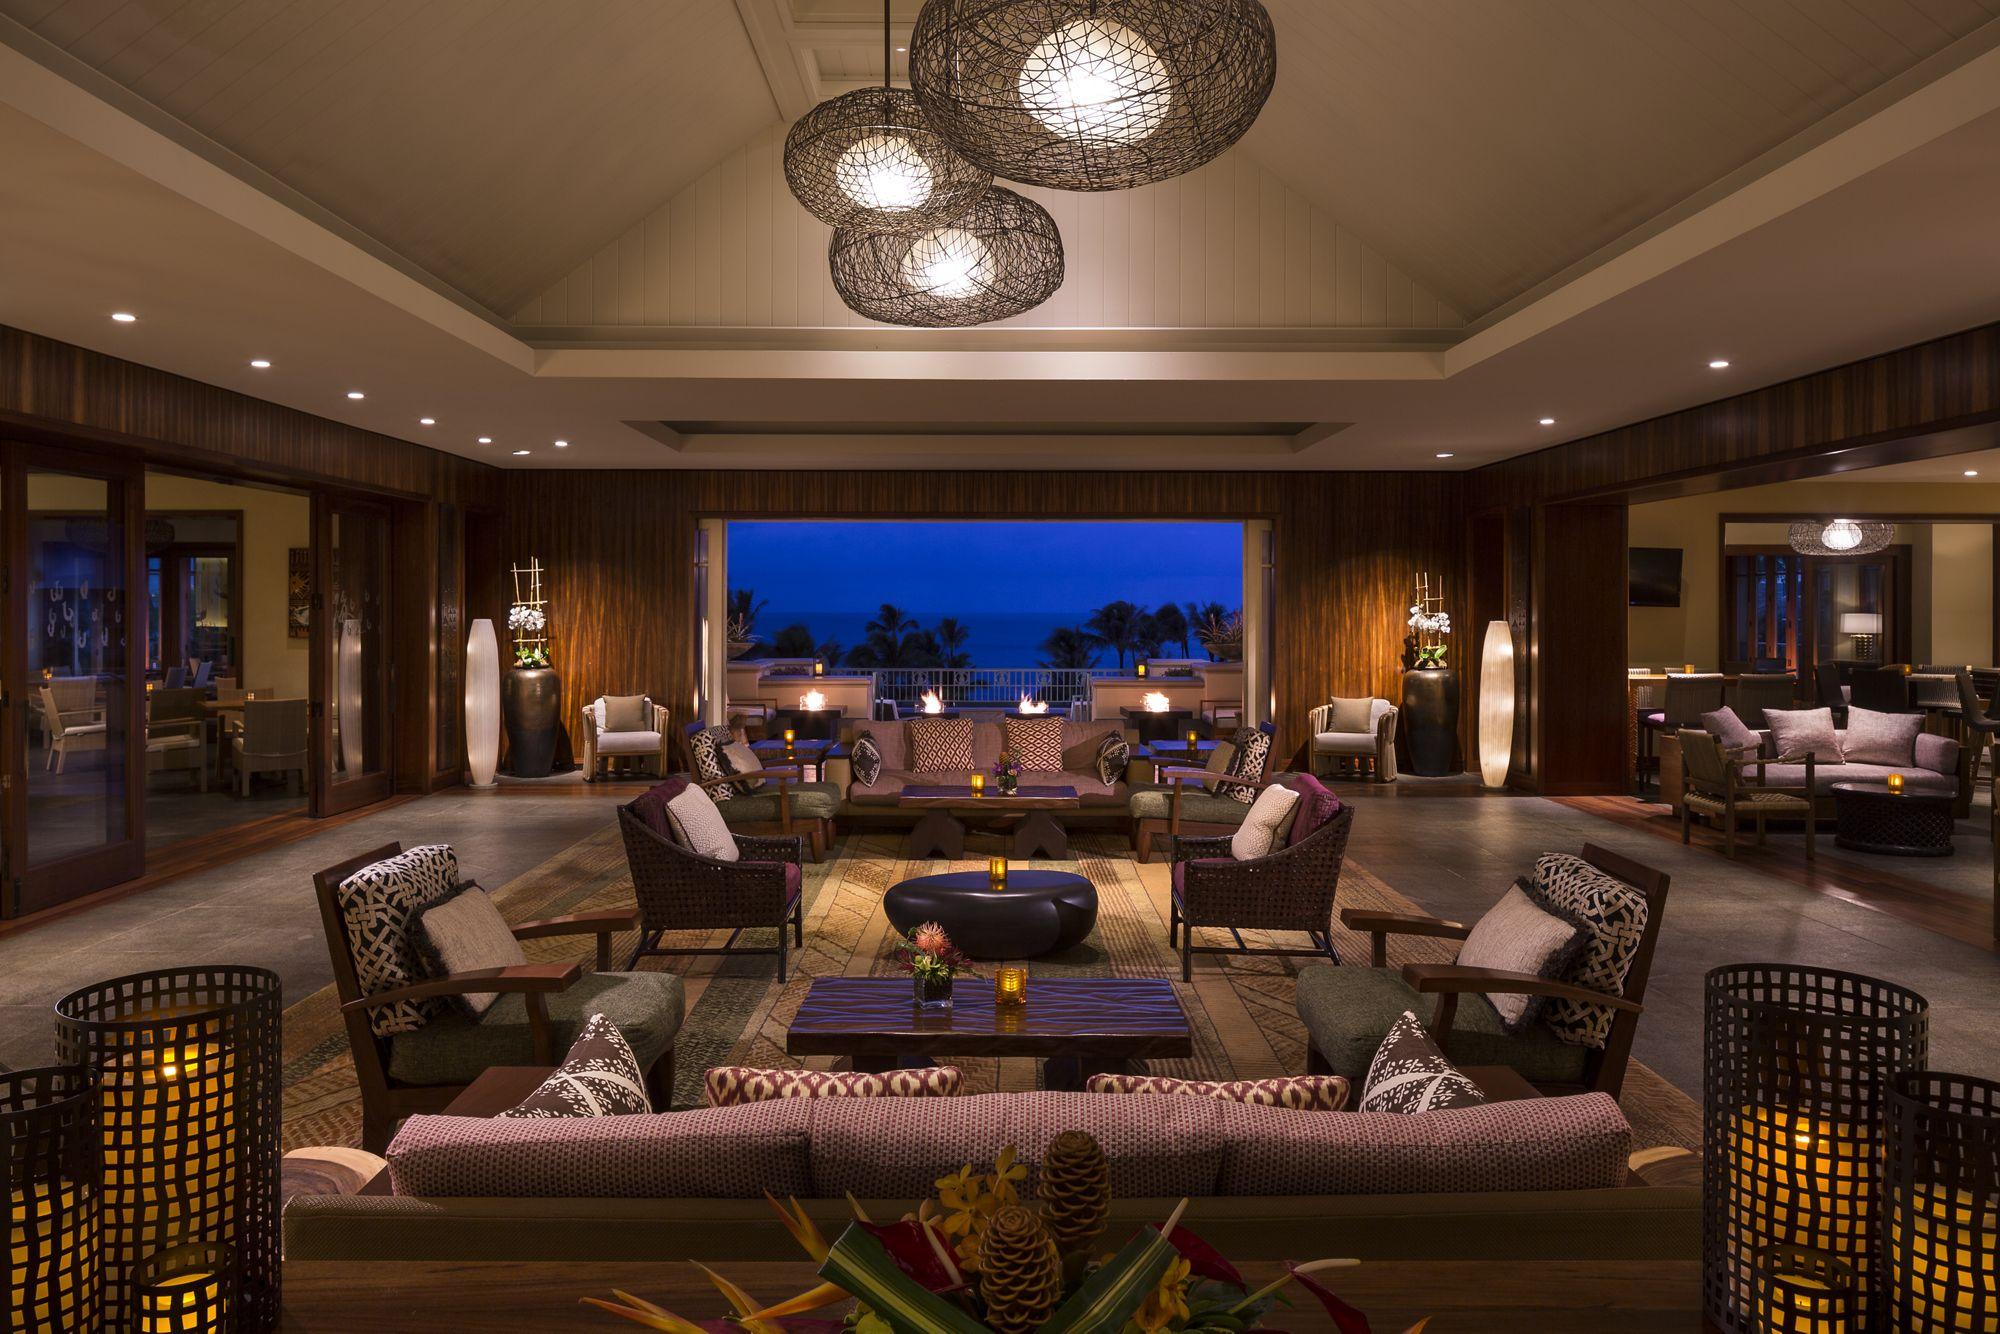 The Ritz-Carlton, Kapalua image 3